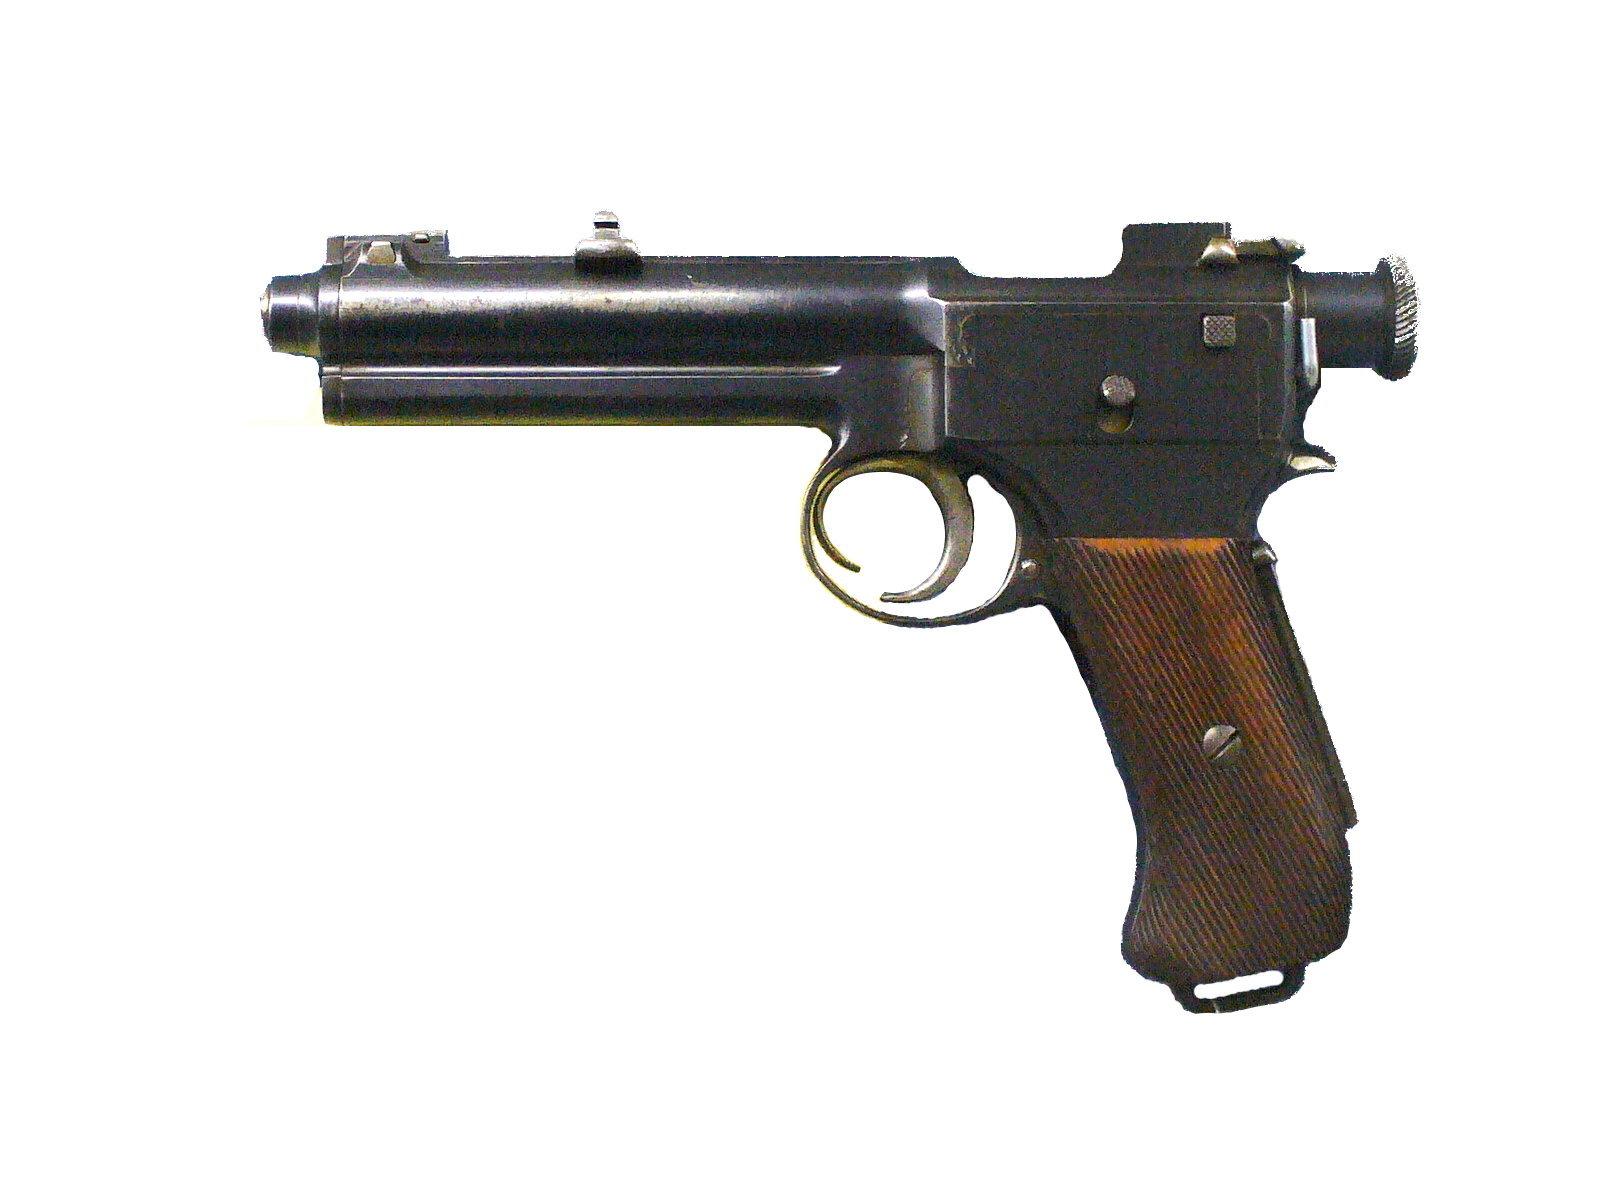 Rothsteyr M1907 Wikipedia